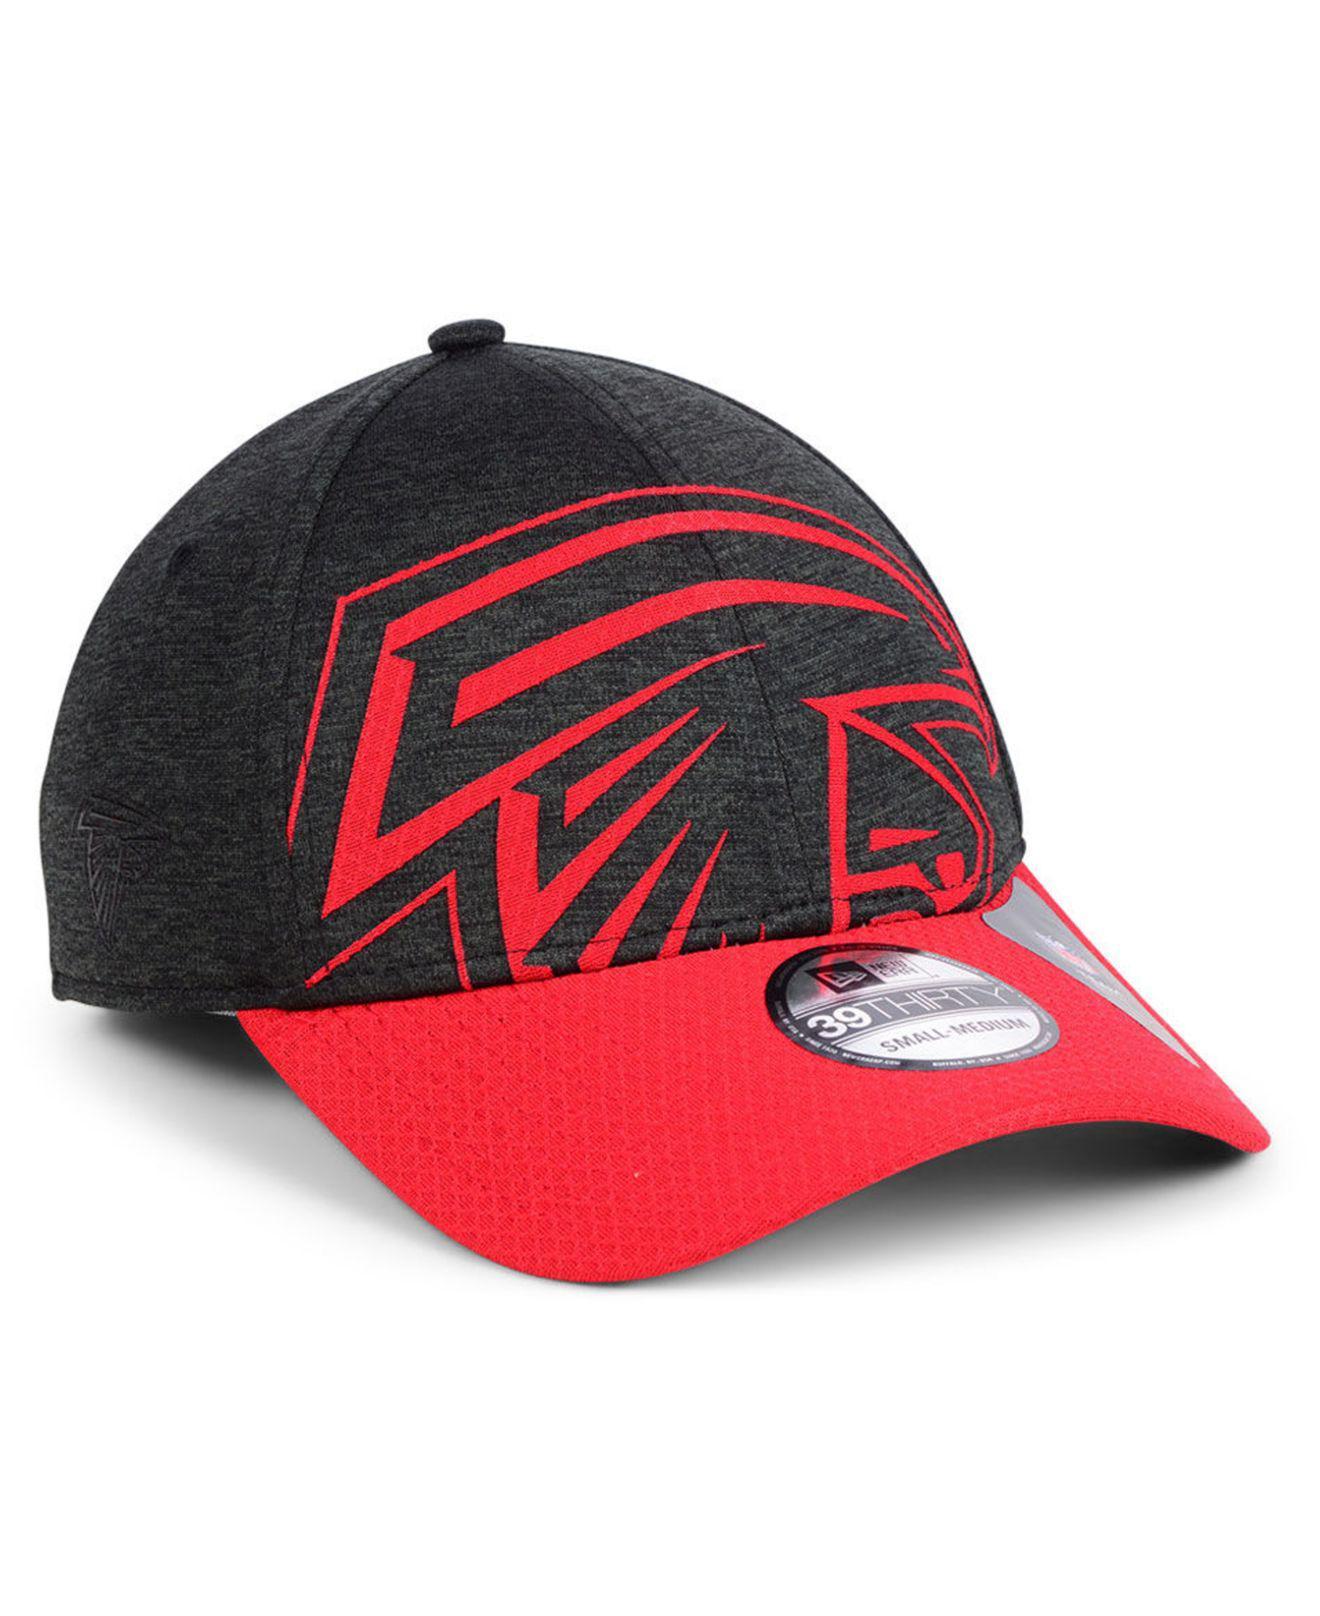 c5456d2b2e7 Lyst - KTZ Atlanta Falcons Oversized Laser Cut Logo 39thirty Cap in ...